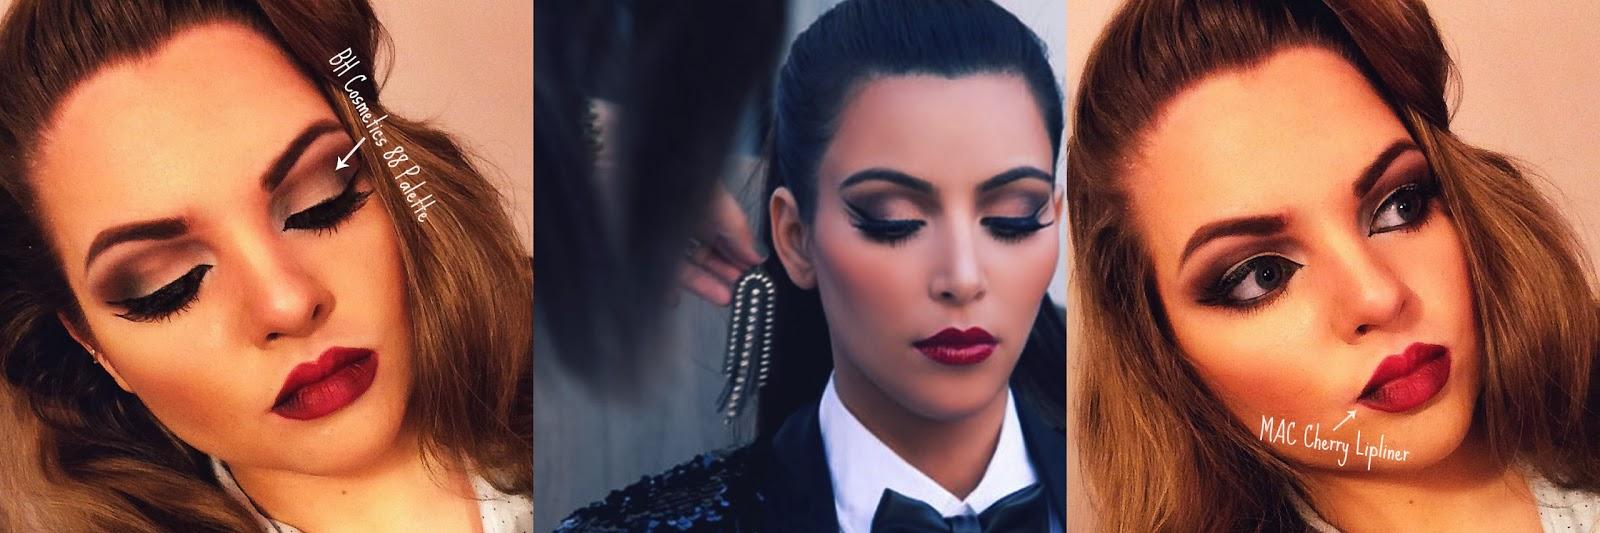 50 kim kardashian crying wallpaper on wallpapersafari - Kim kardashian crying collage ...